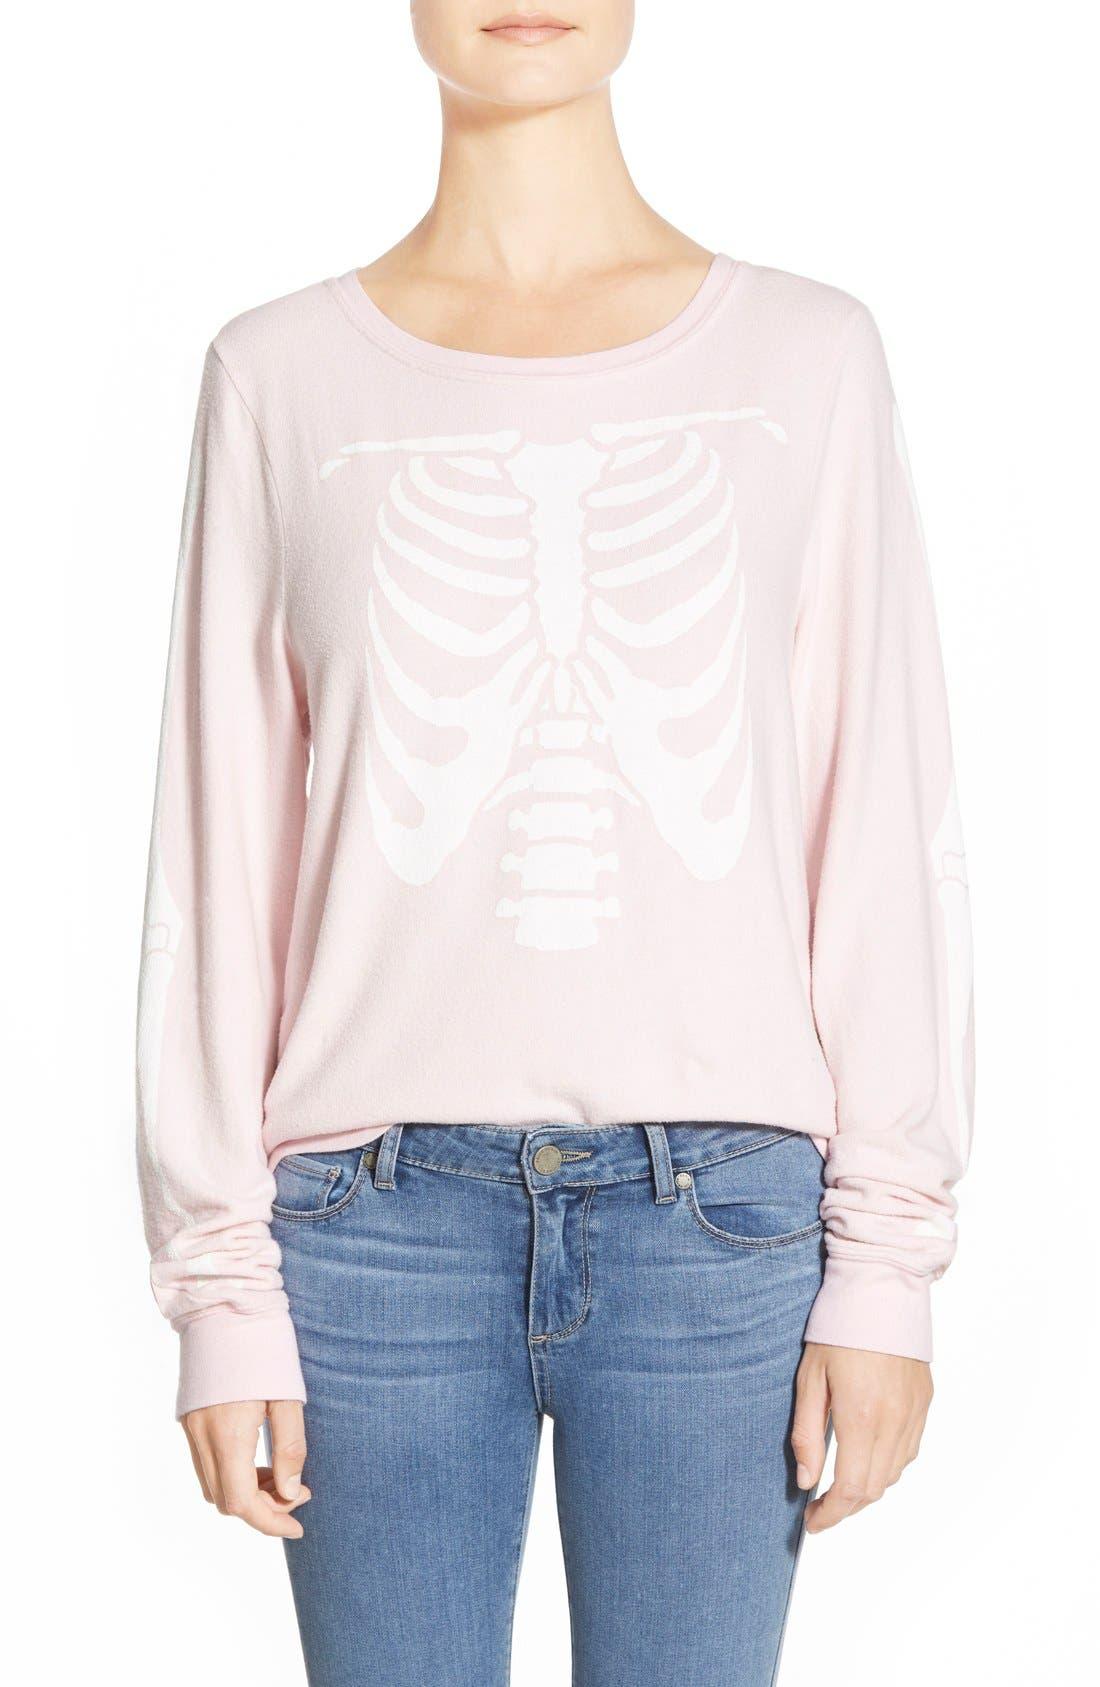 Alternate Image 1 Selected - Wildfox 'Inside Out' Long Sleeve Sweatshirt